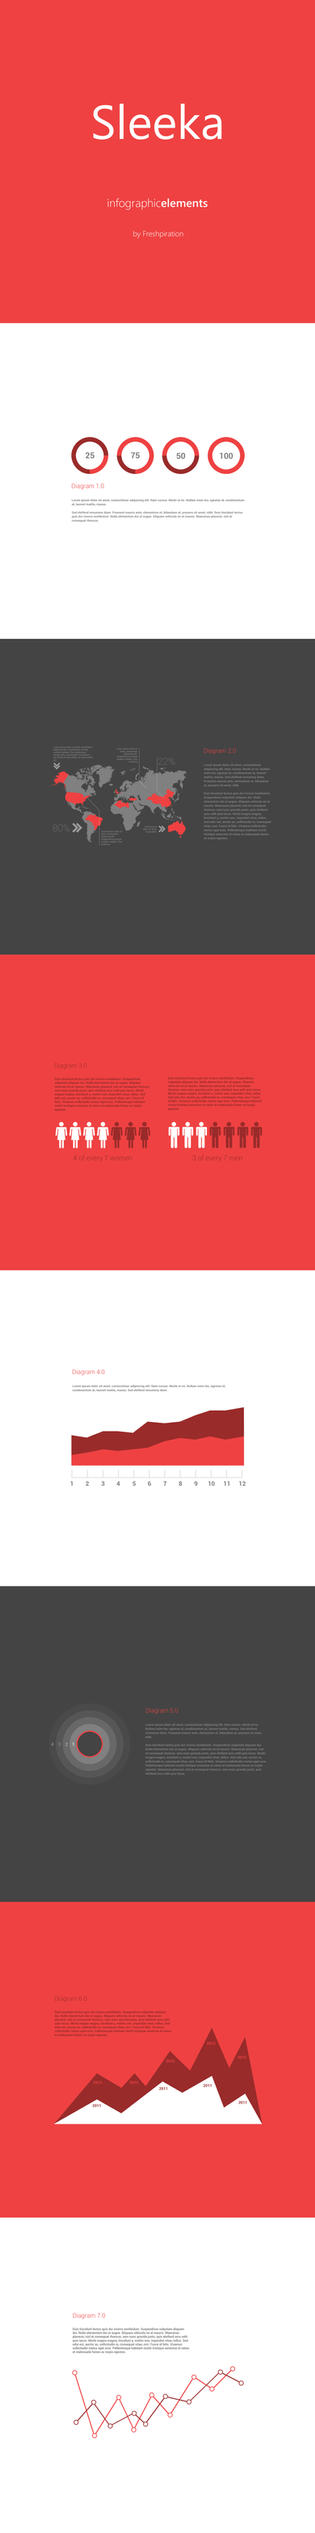 Sleeka - Infographic Elements by SMHYLMZ